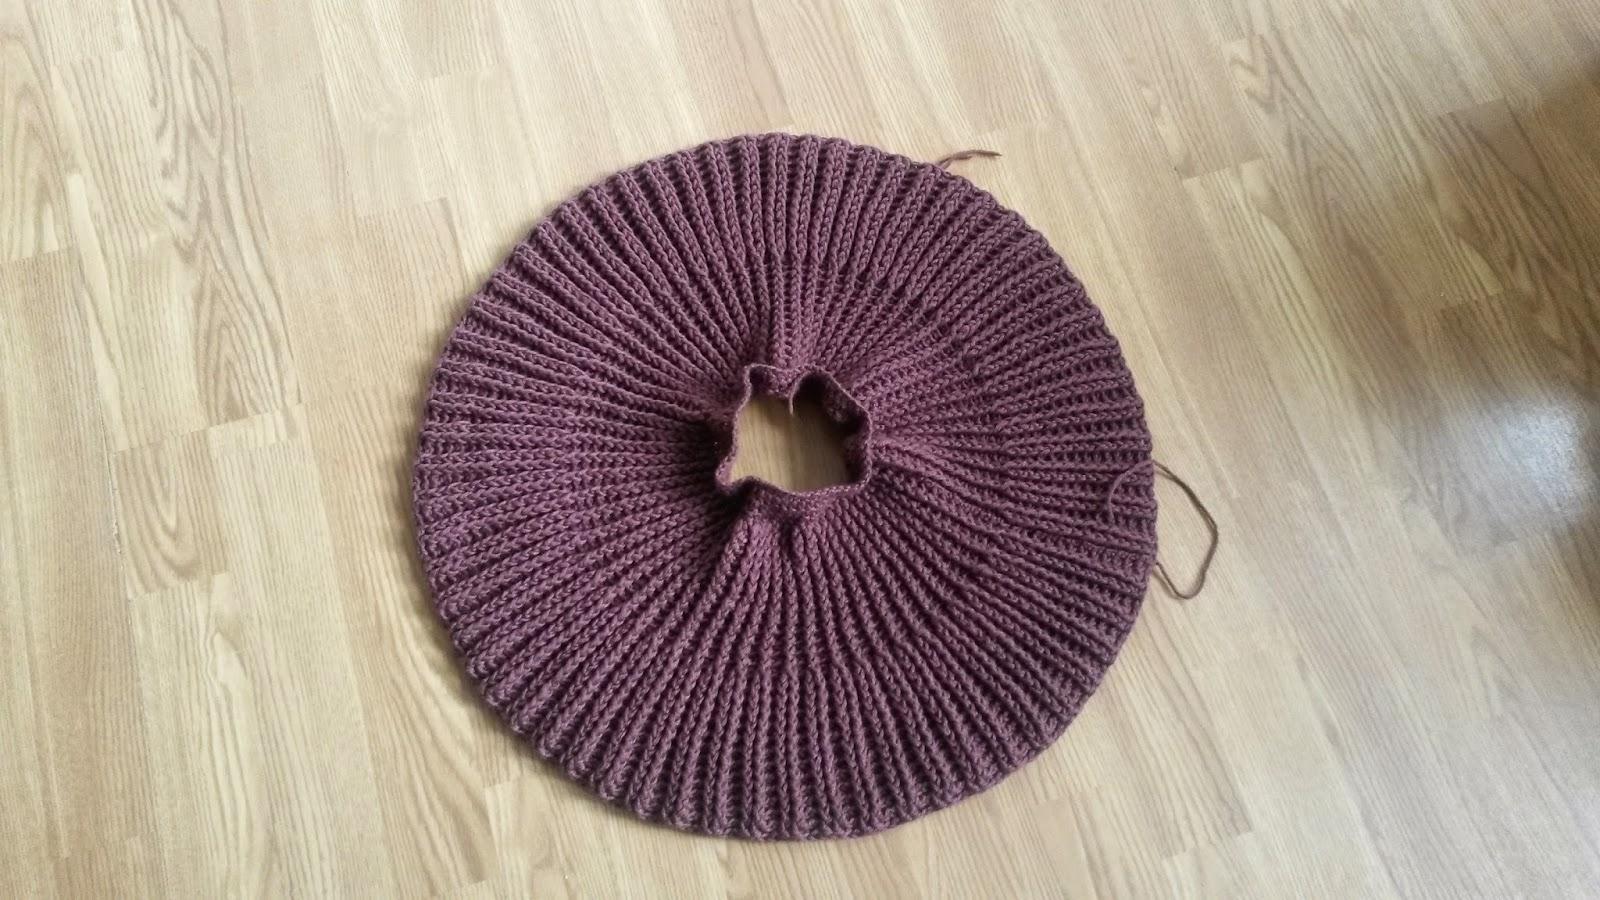 Crocheted version of Pickles' Baggy Bolero